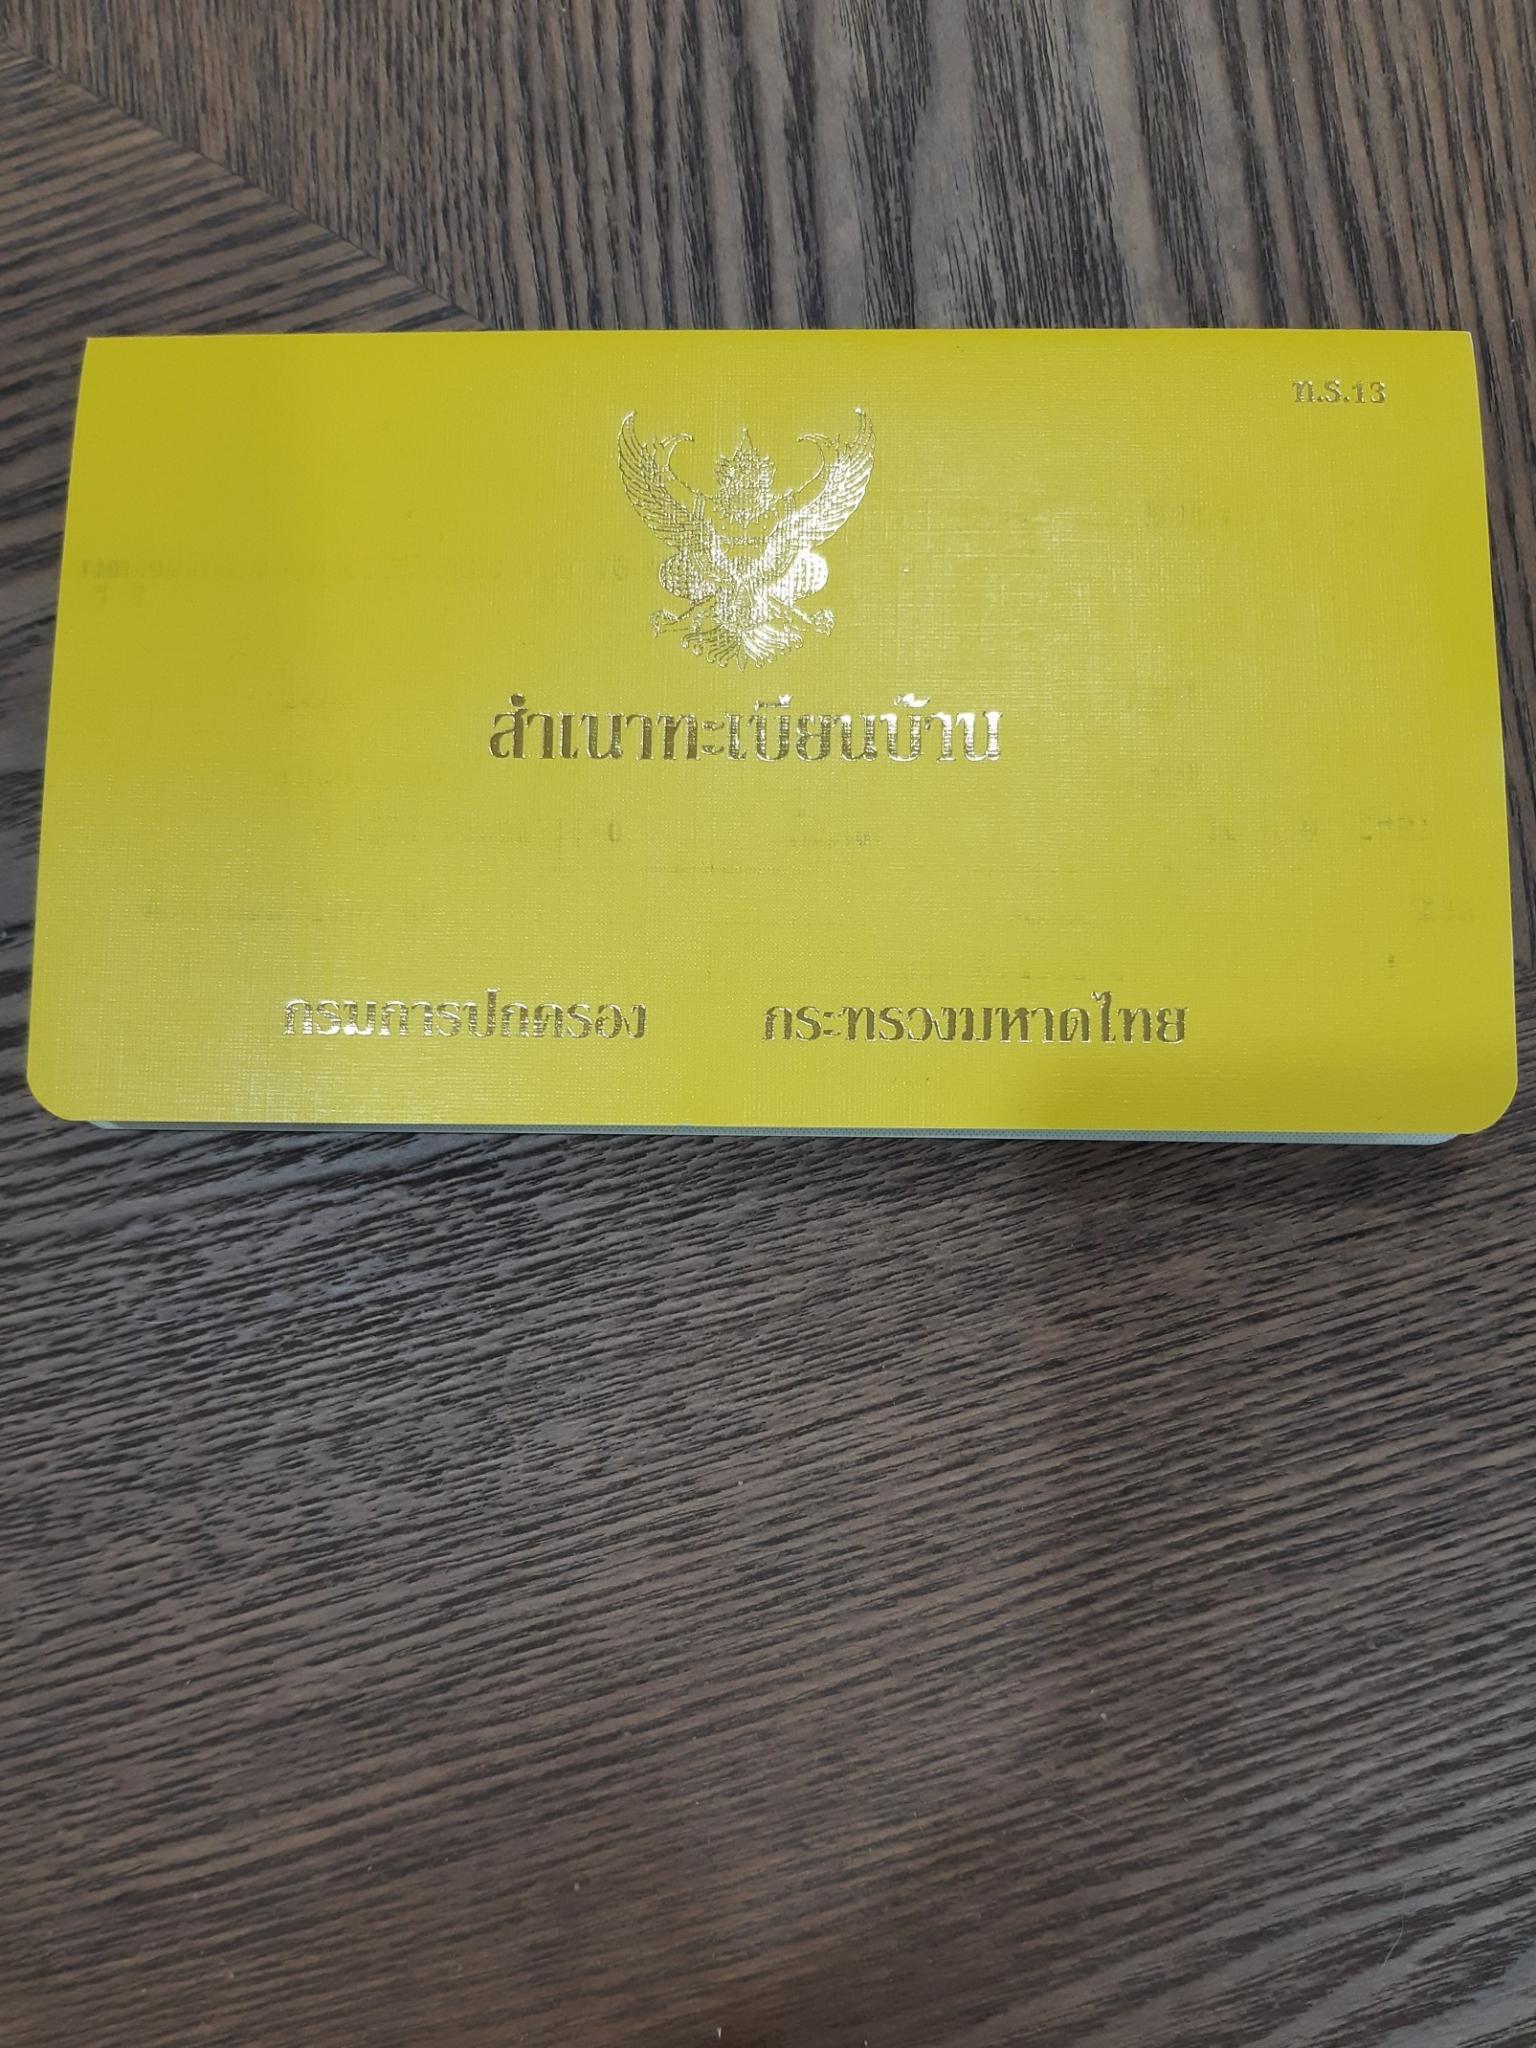 Daily or weekly cheer-yellow-book2-jpg